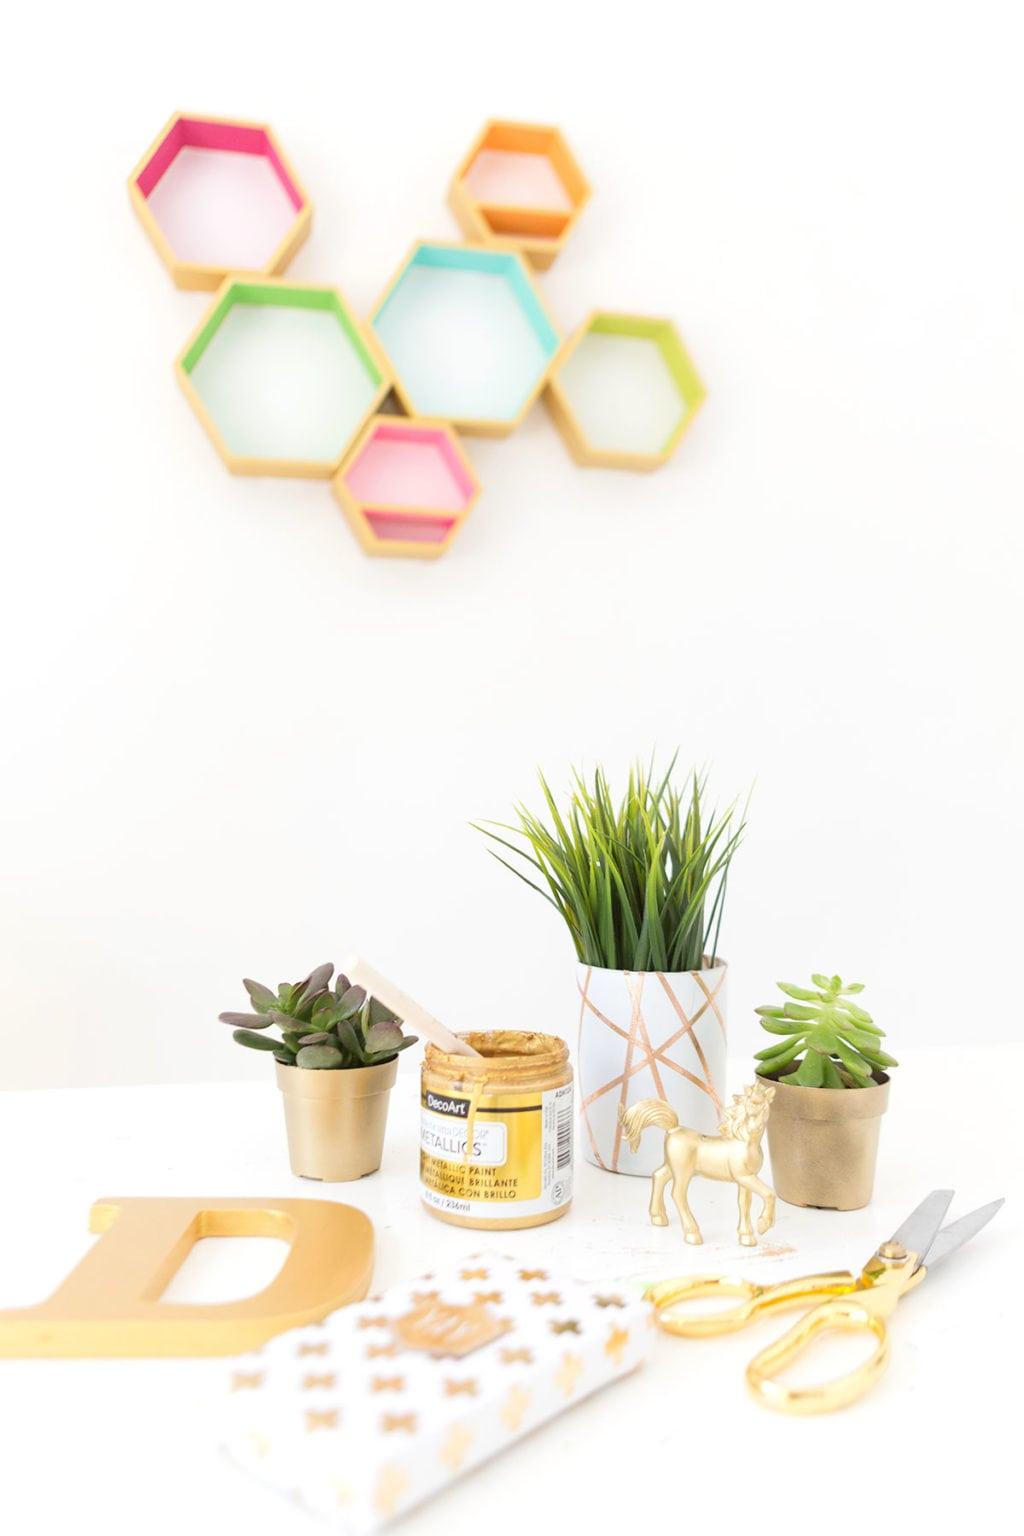 Decoart metallic hexagon wood shelves damask love create these decoart metallic hexagon wall shelves using decoart gold metallic paints to add perfect shimmer amipublicfo Gallery